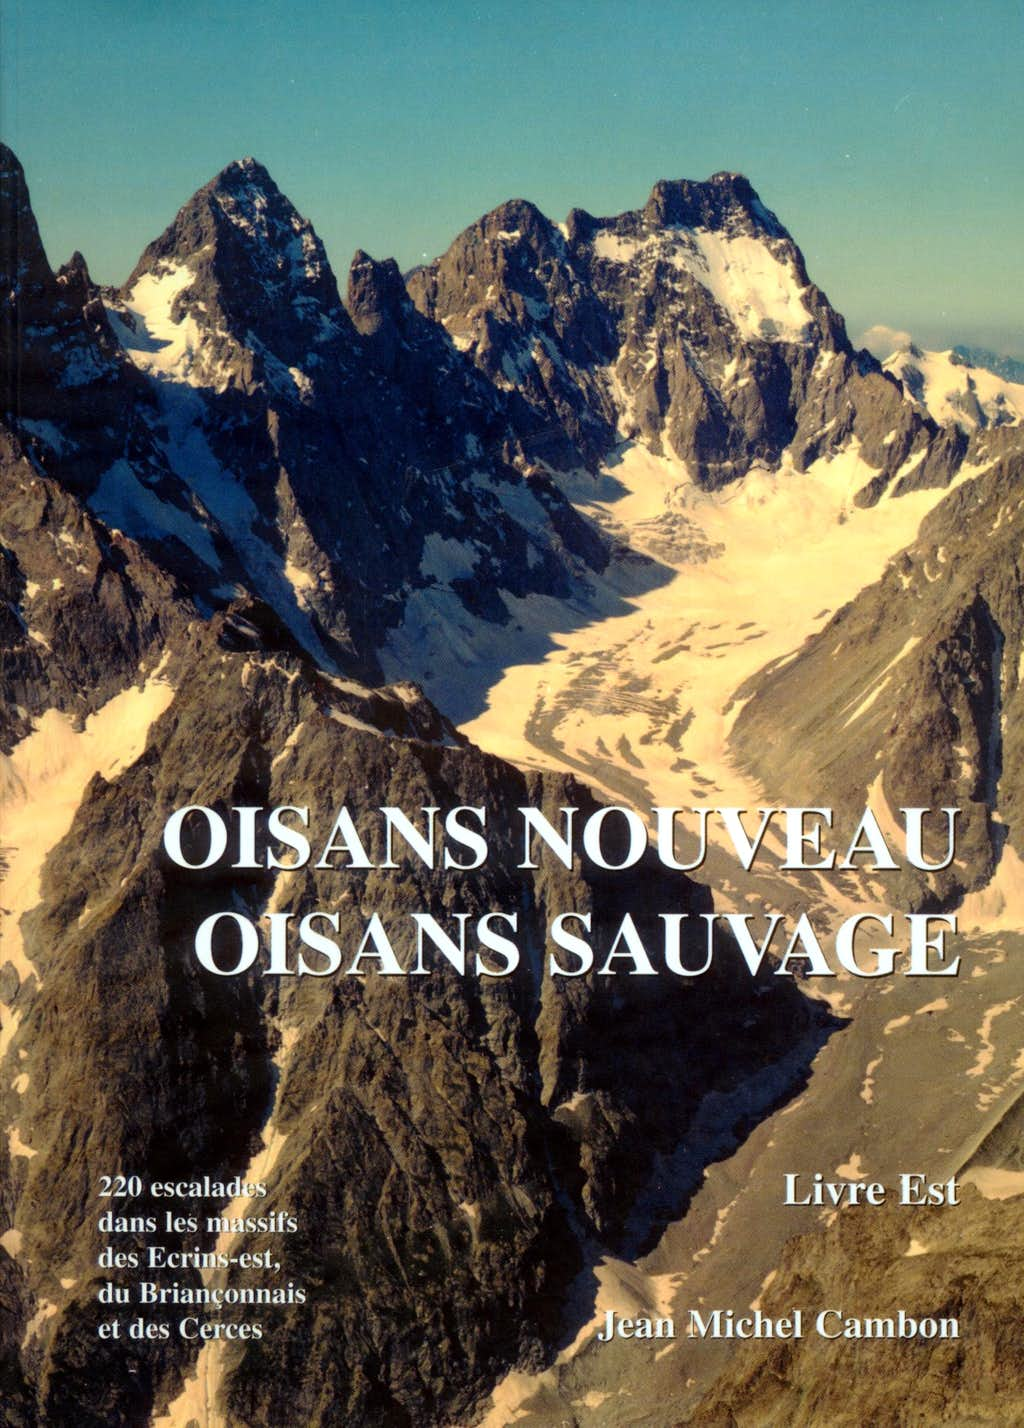 Oisans Nouveau Oisans Sauvage guidebook